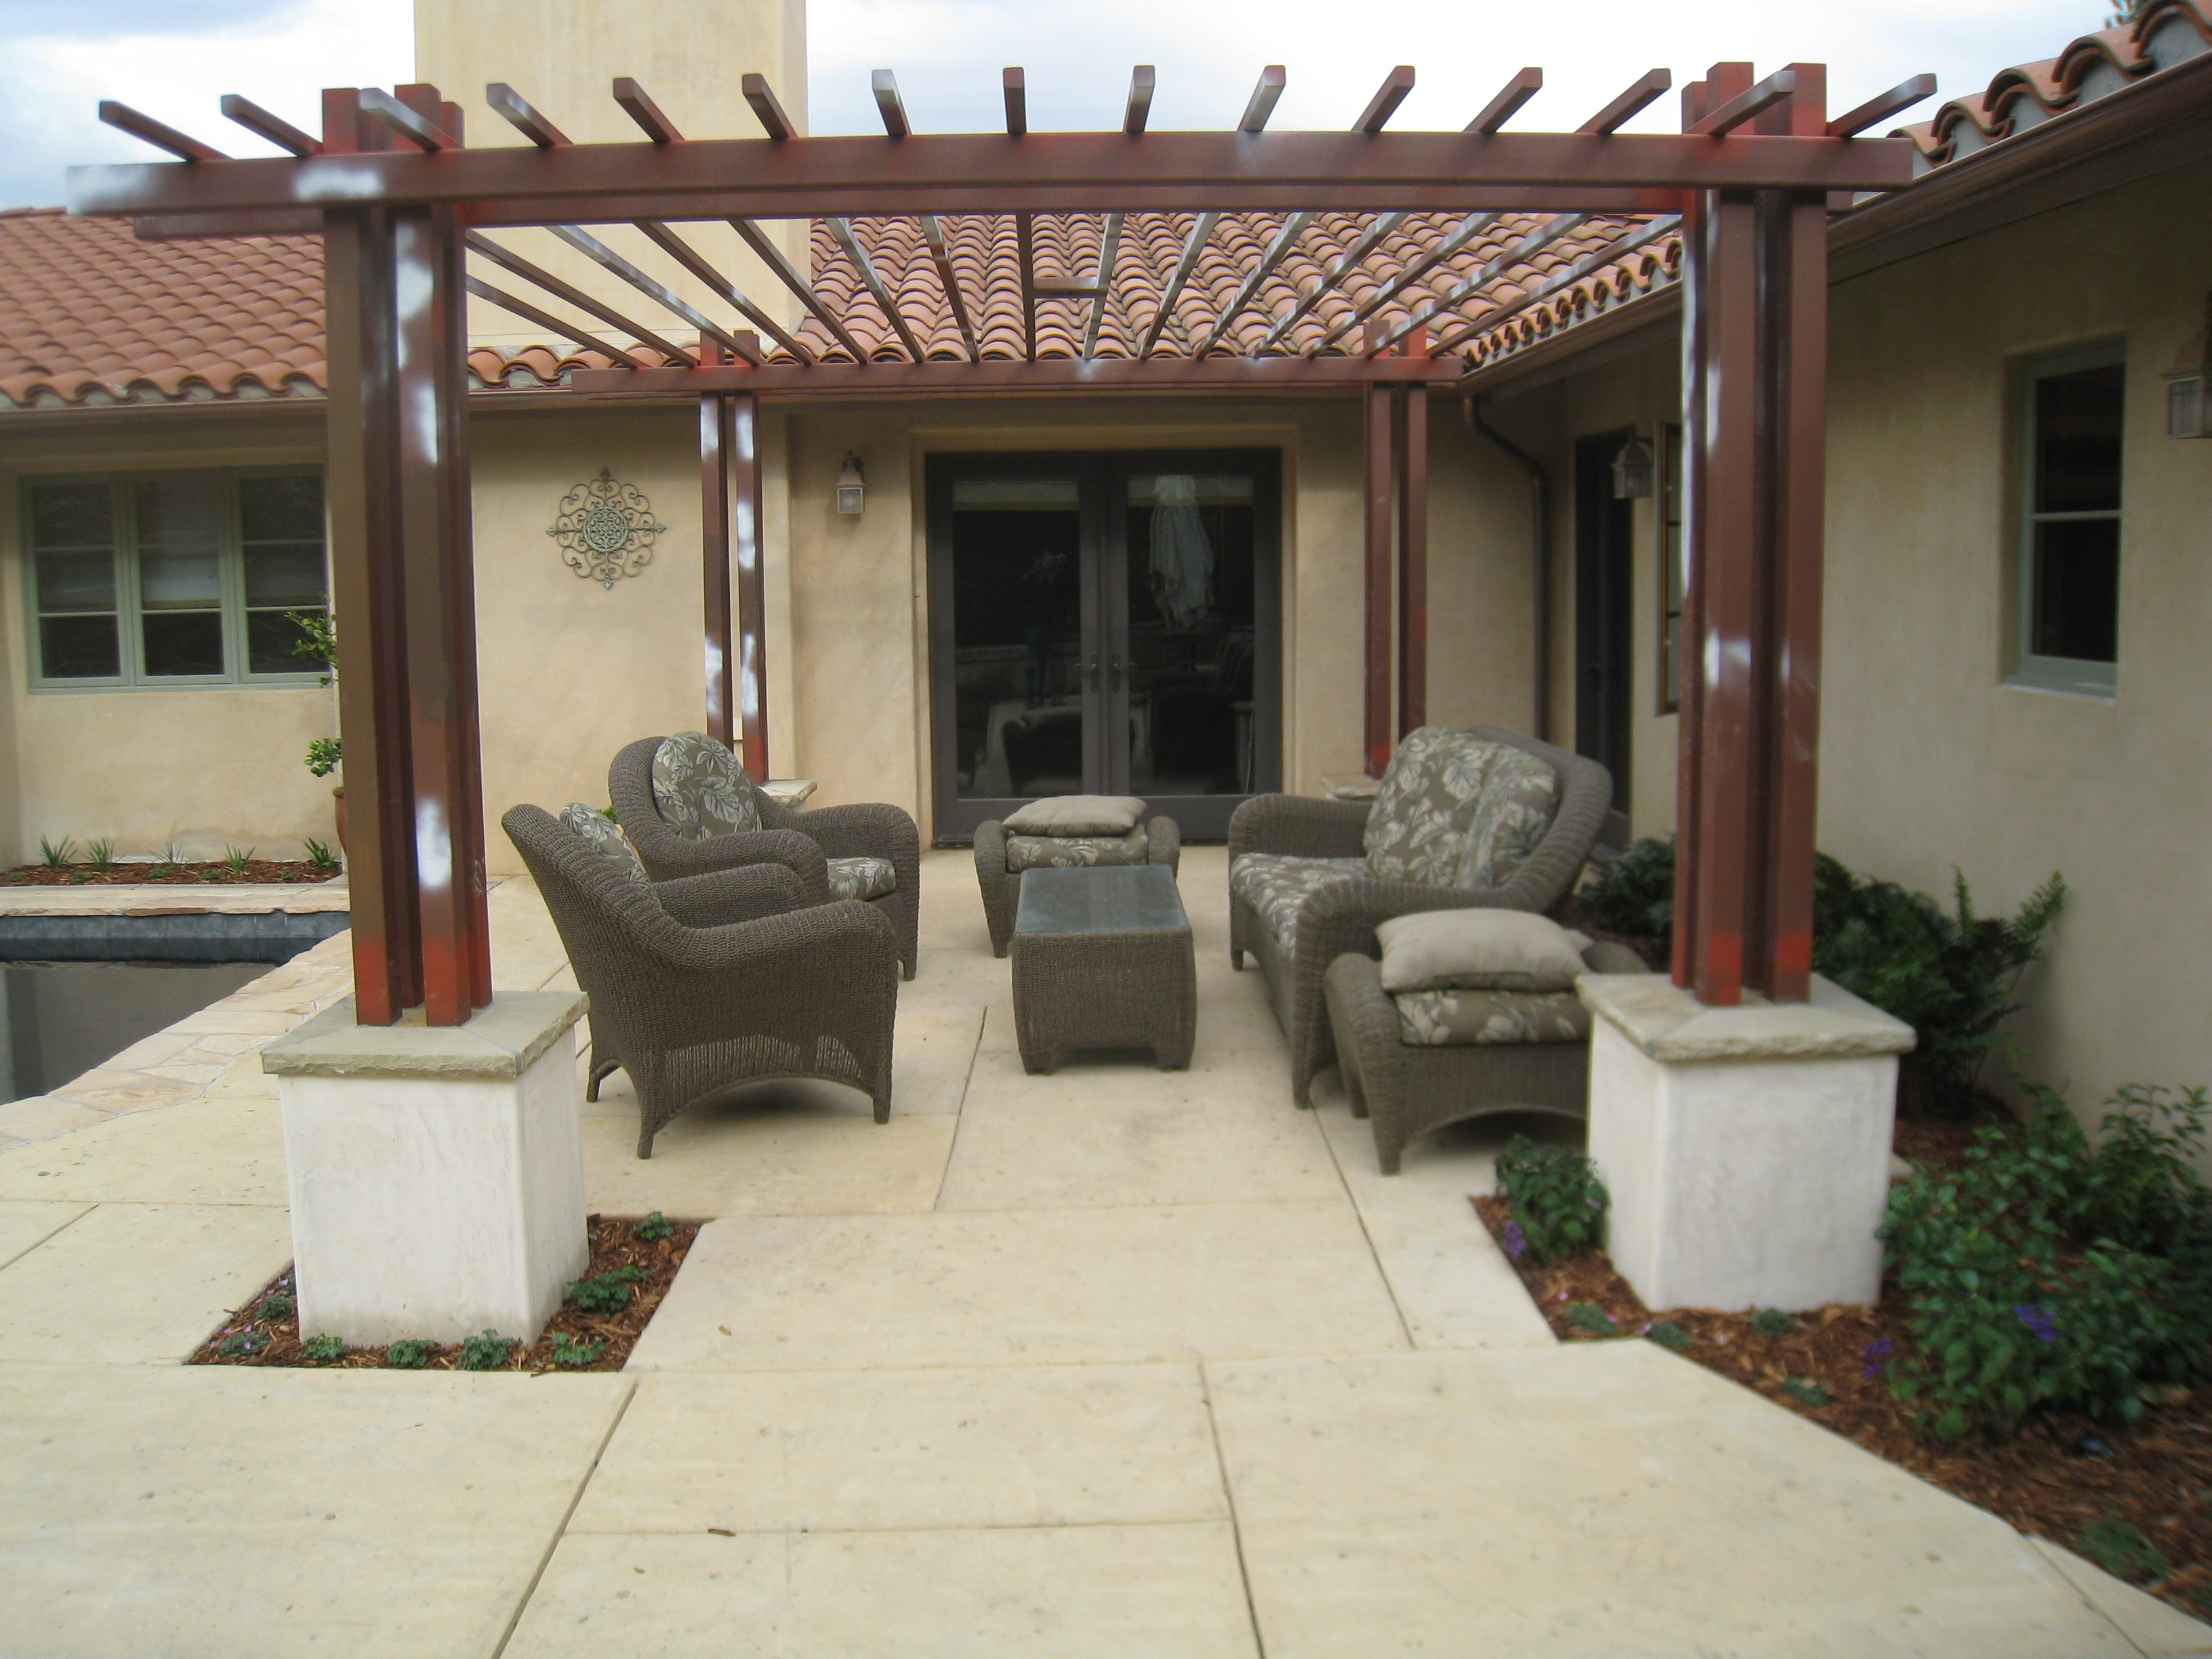 backyard kitchens kitchen granite patio ideas in santa barbara outdoor 93103